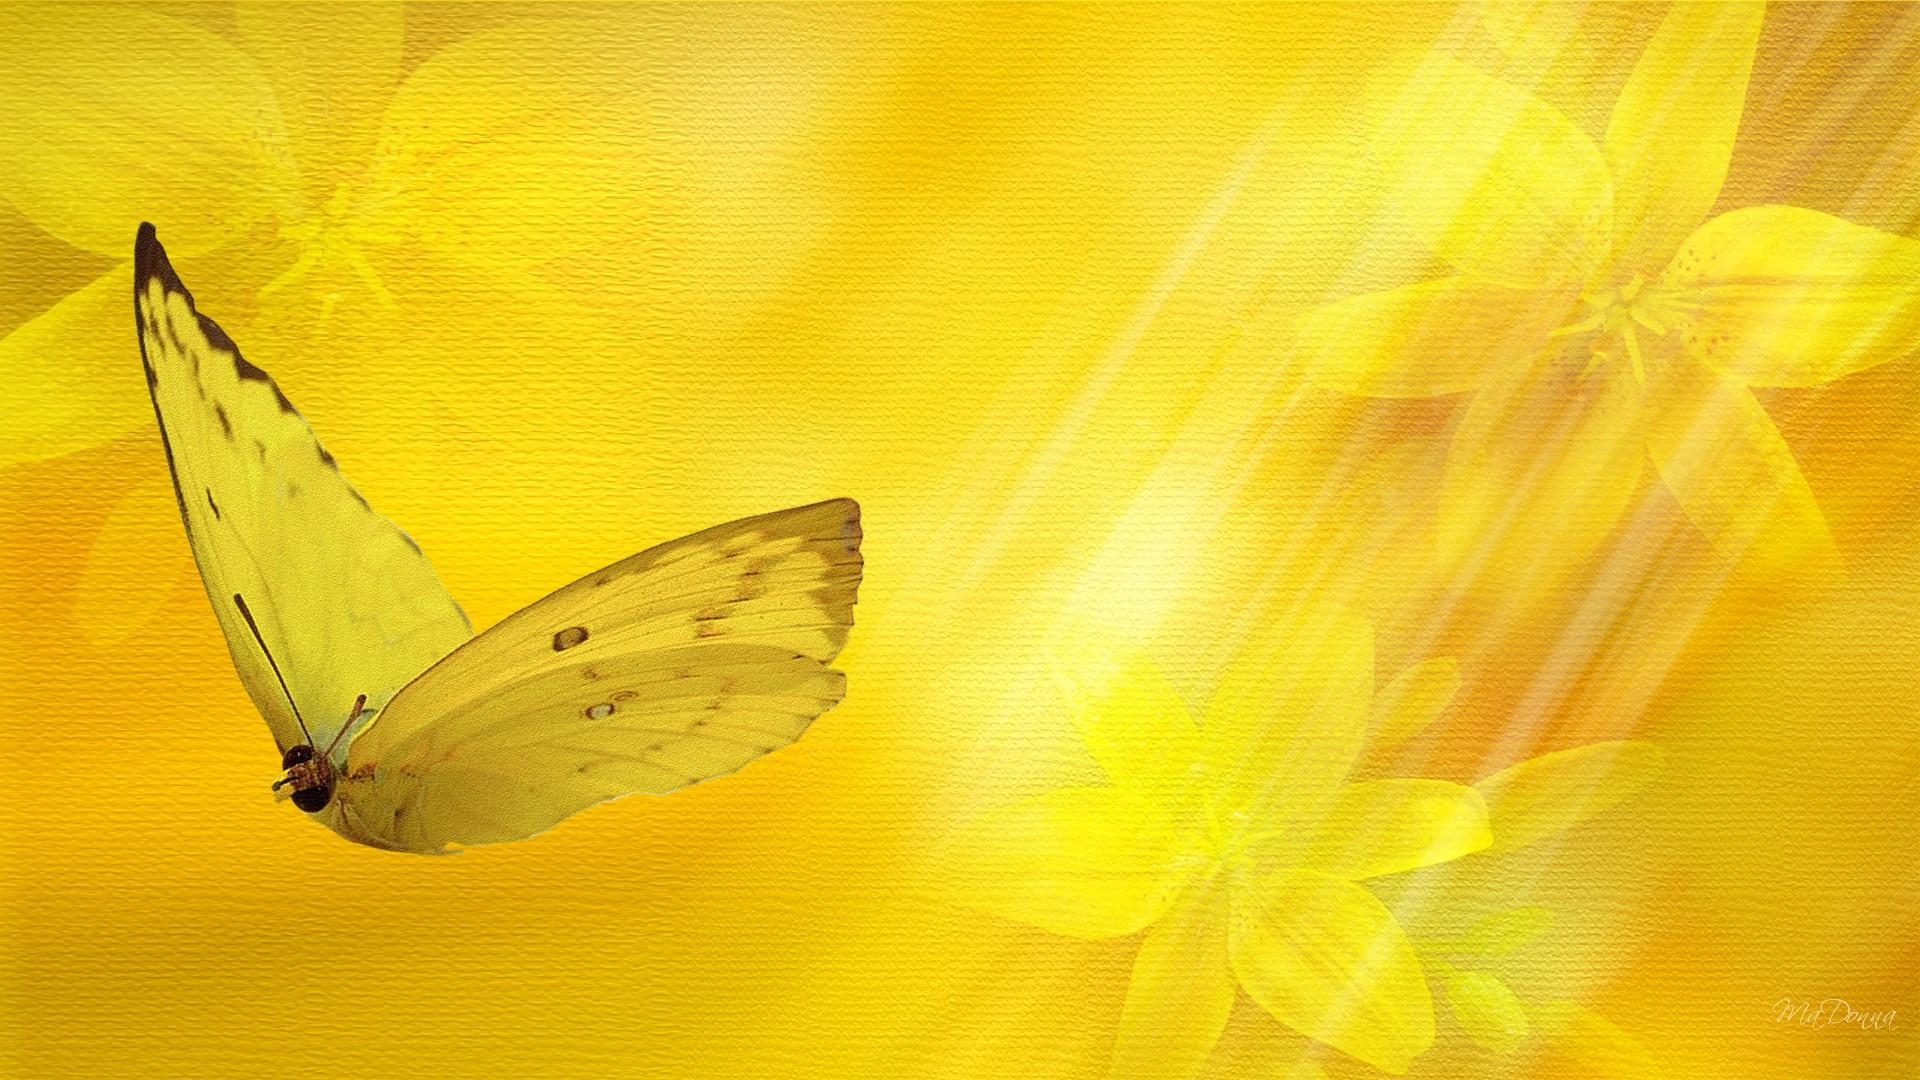 Yellow Floral Hd Wallpaper